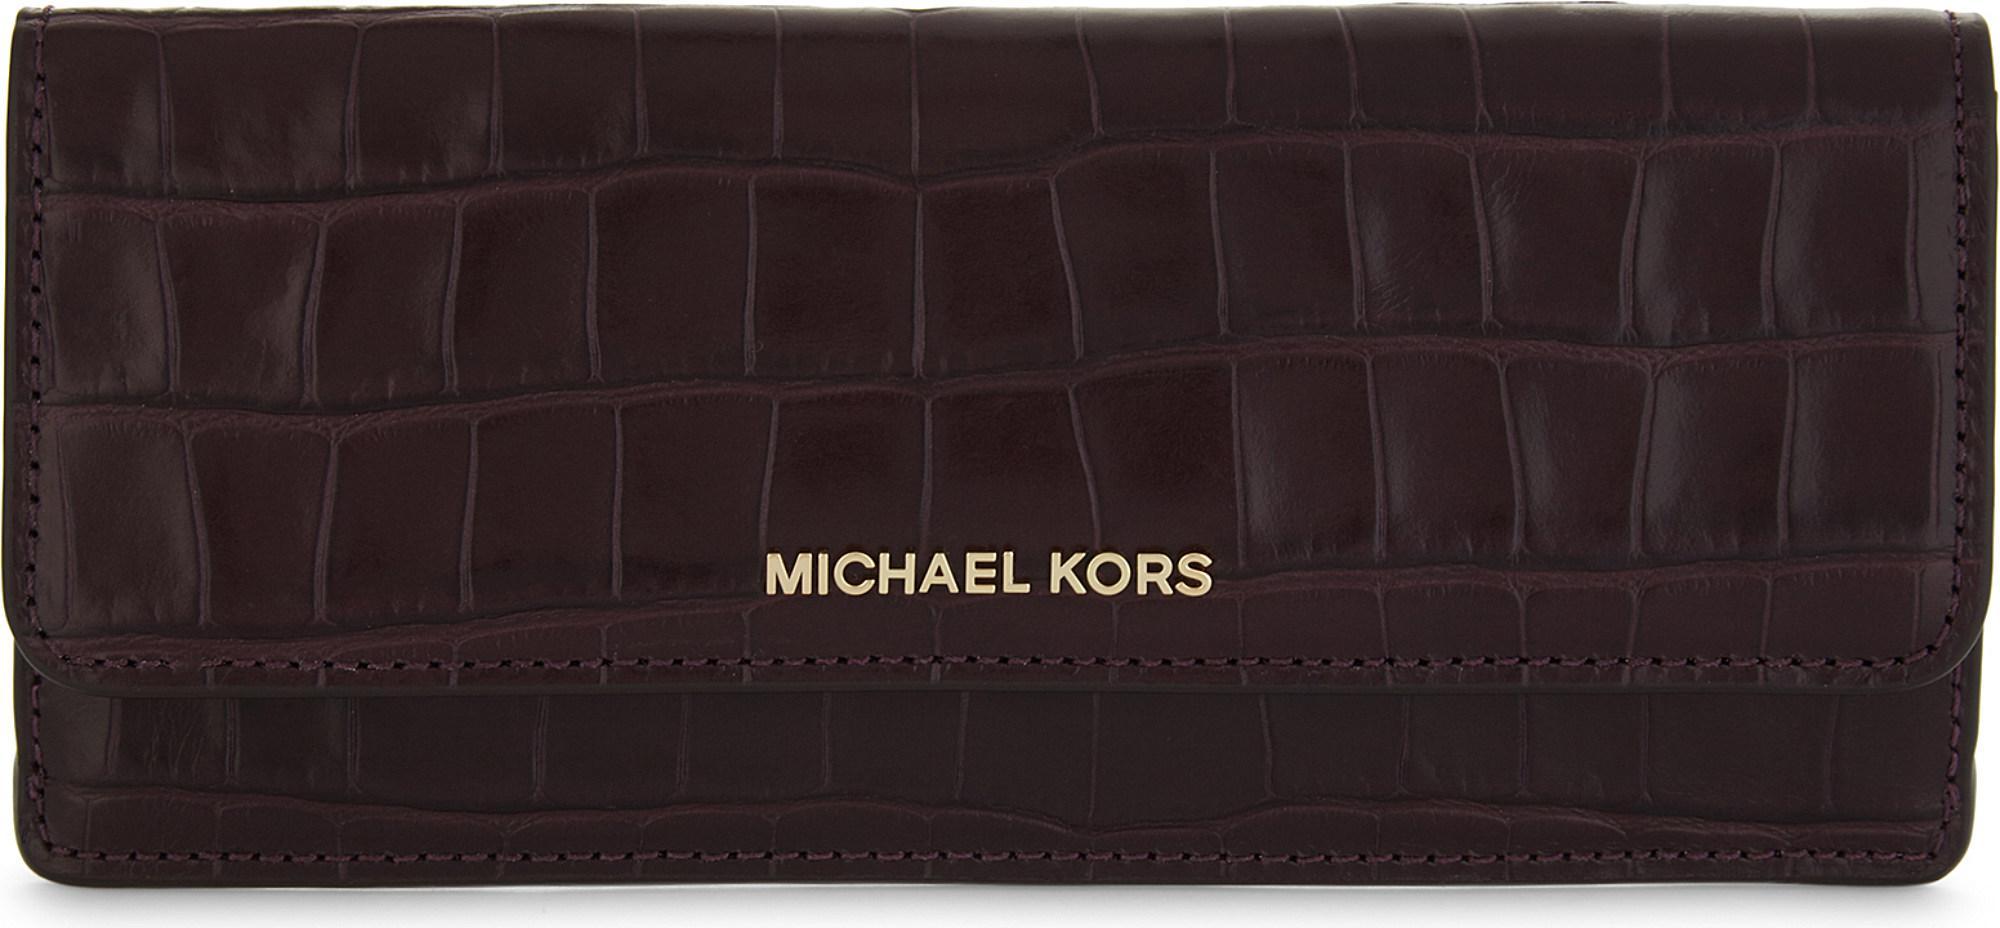 b950967fccf3 Lyst - MICHAEL Michael Kors Money Pieces Crocodile-embossed Leather ...